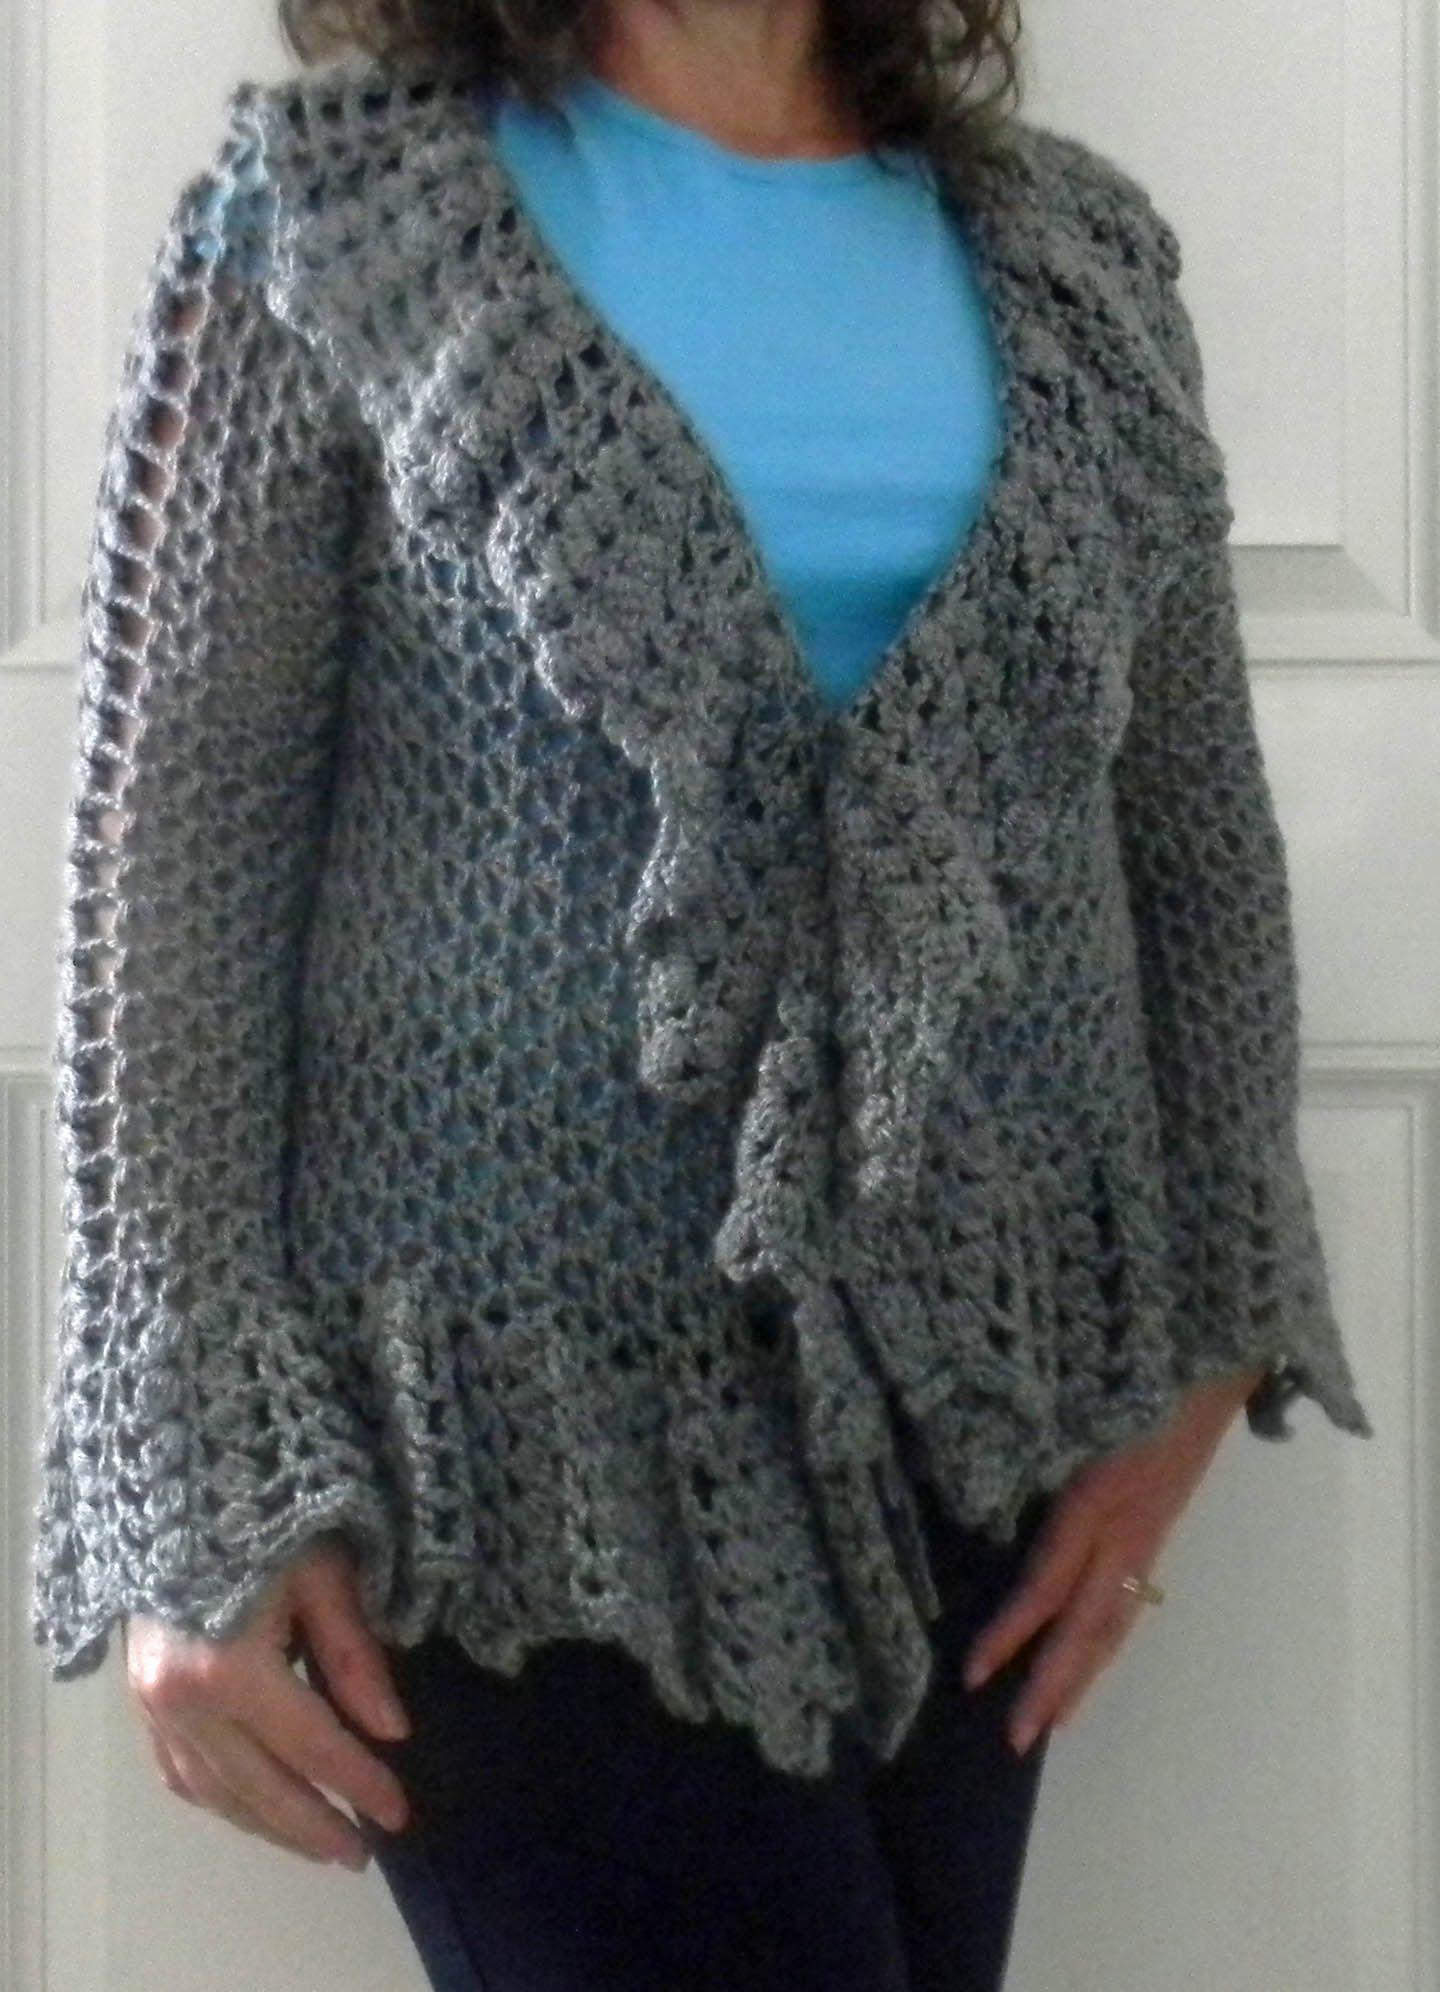 Caron circle jacket free pattern crochet pinterest free caron circle jacket free pattern bankloansurffo Image collections